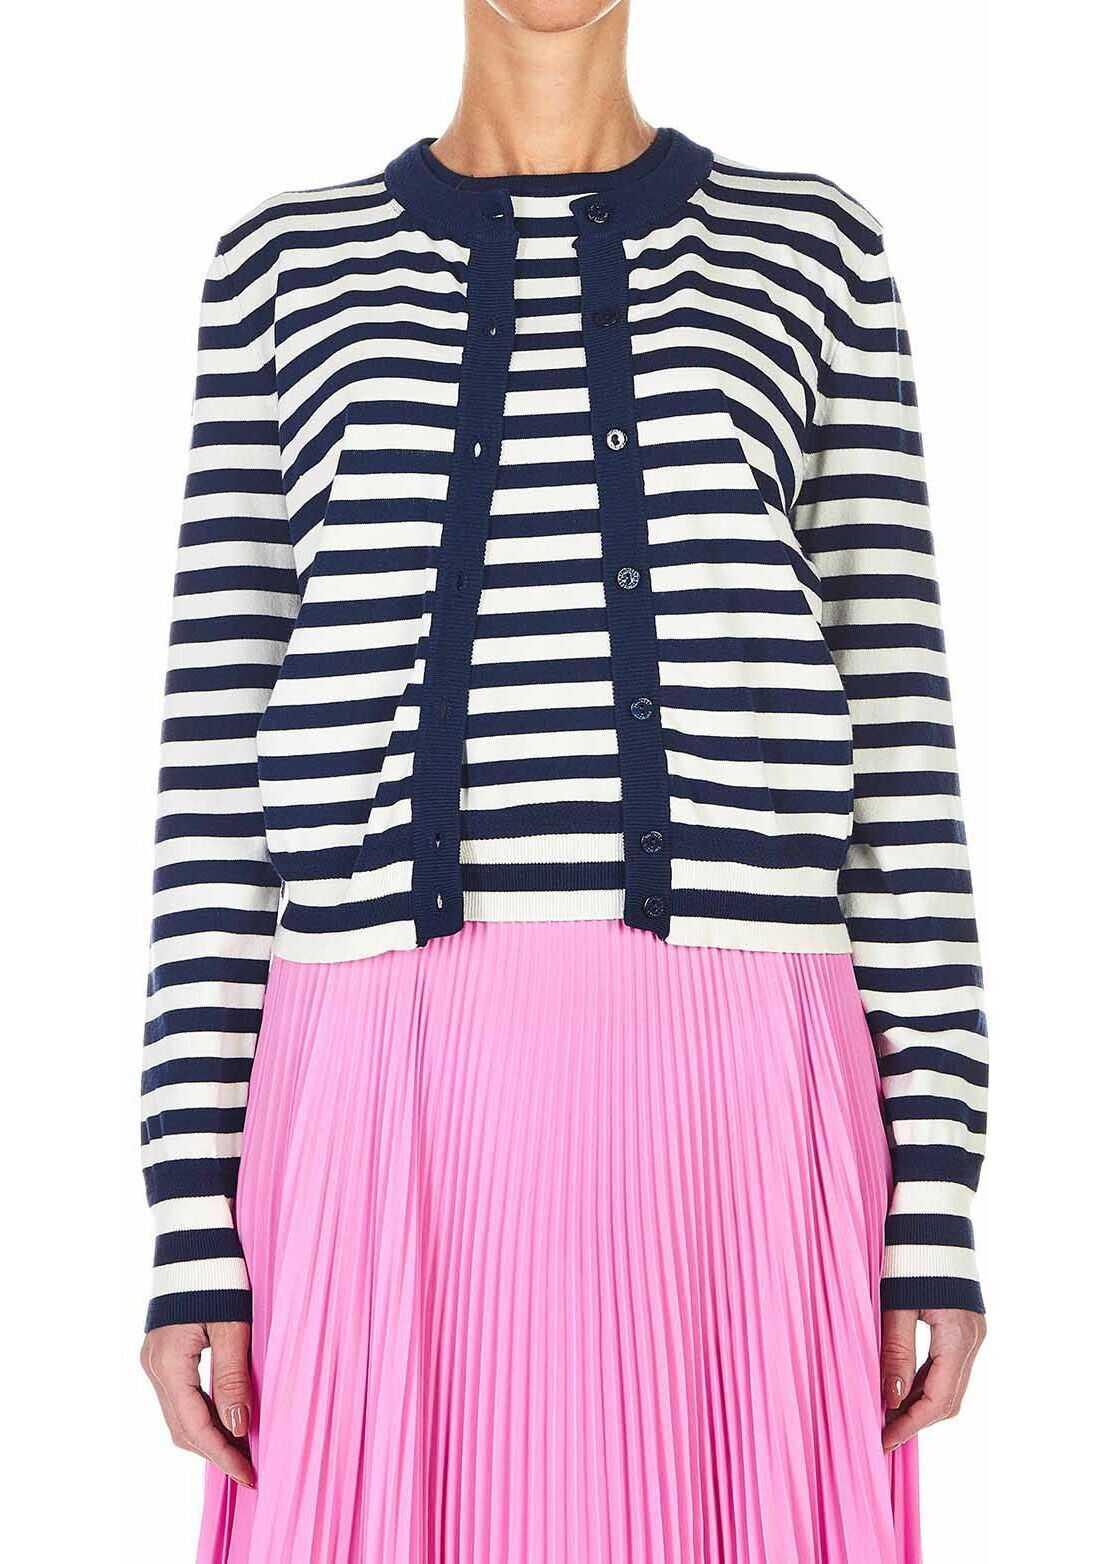 Twin-set Simona Barbieri A set of a striped slipover and cardigan Blue